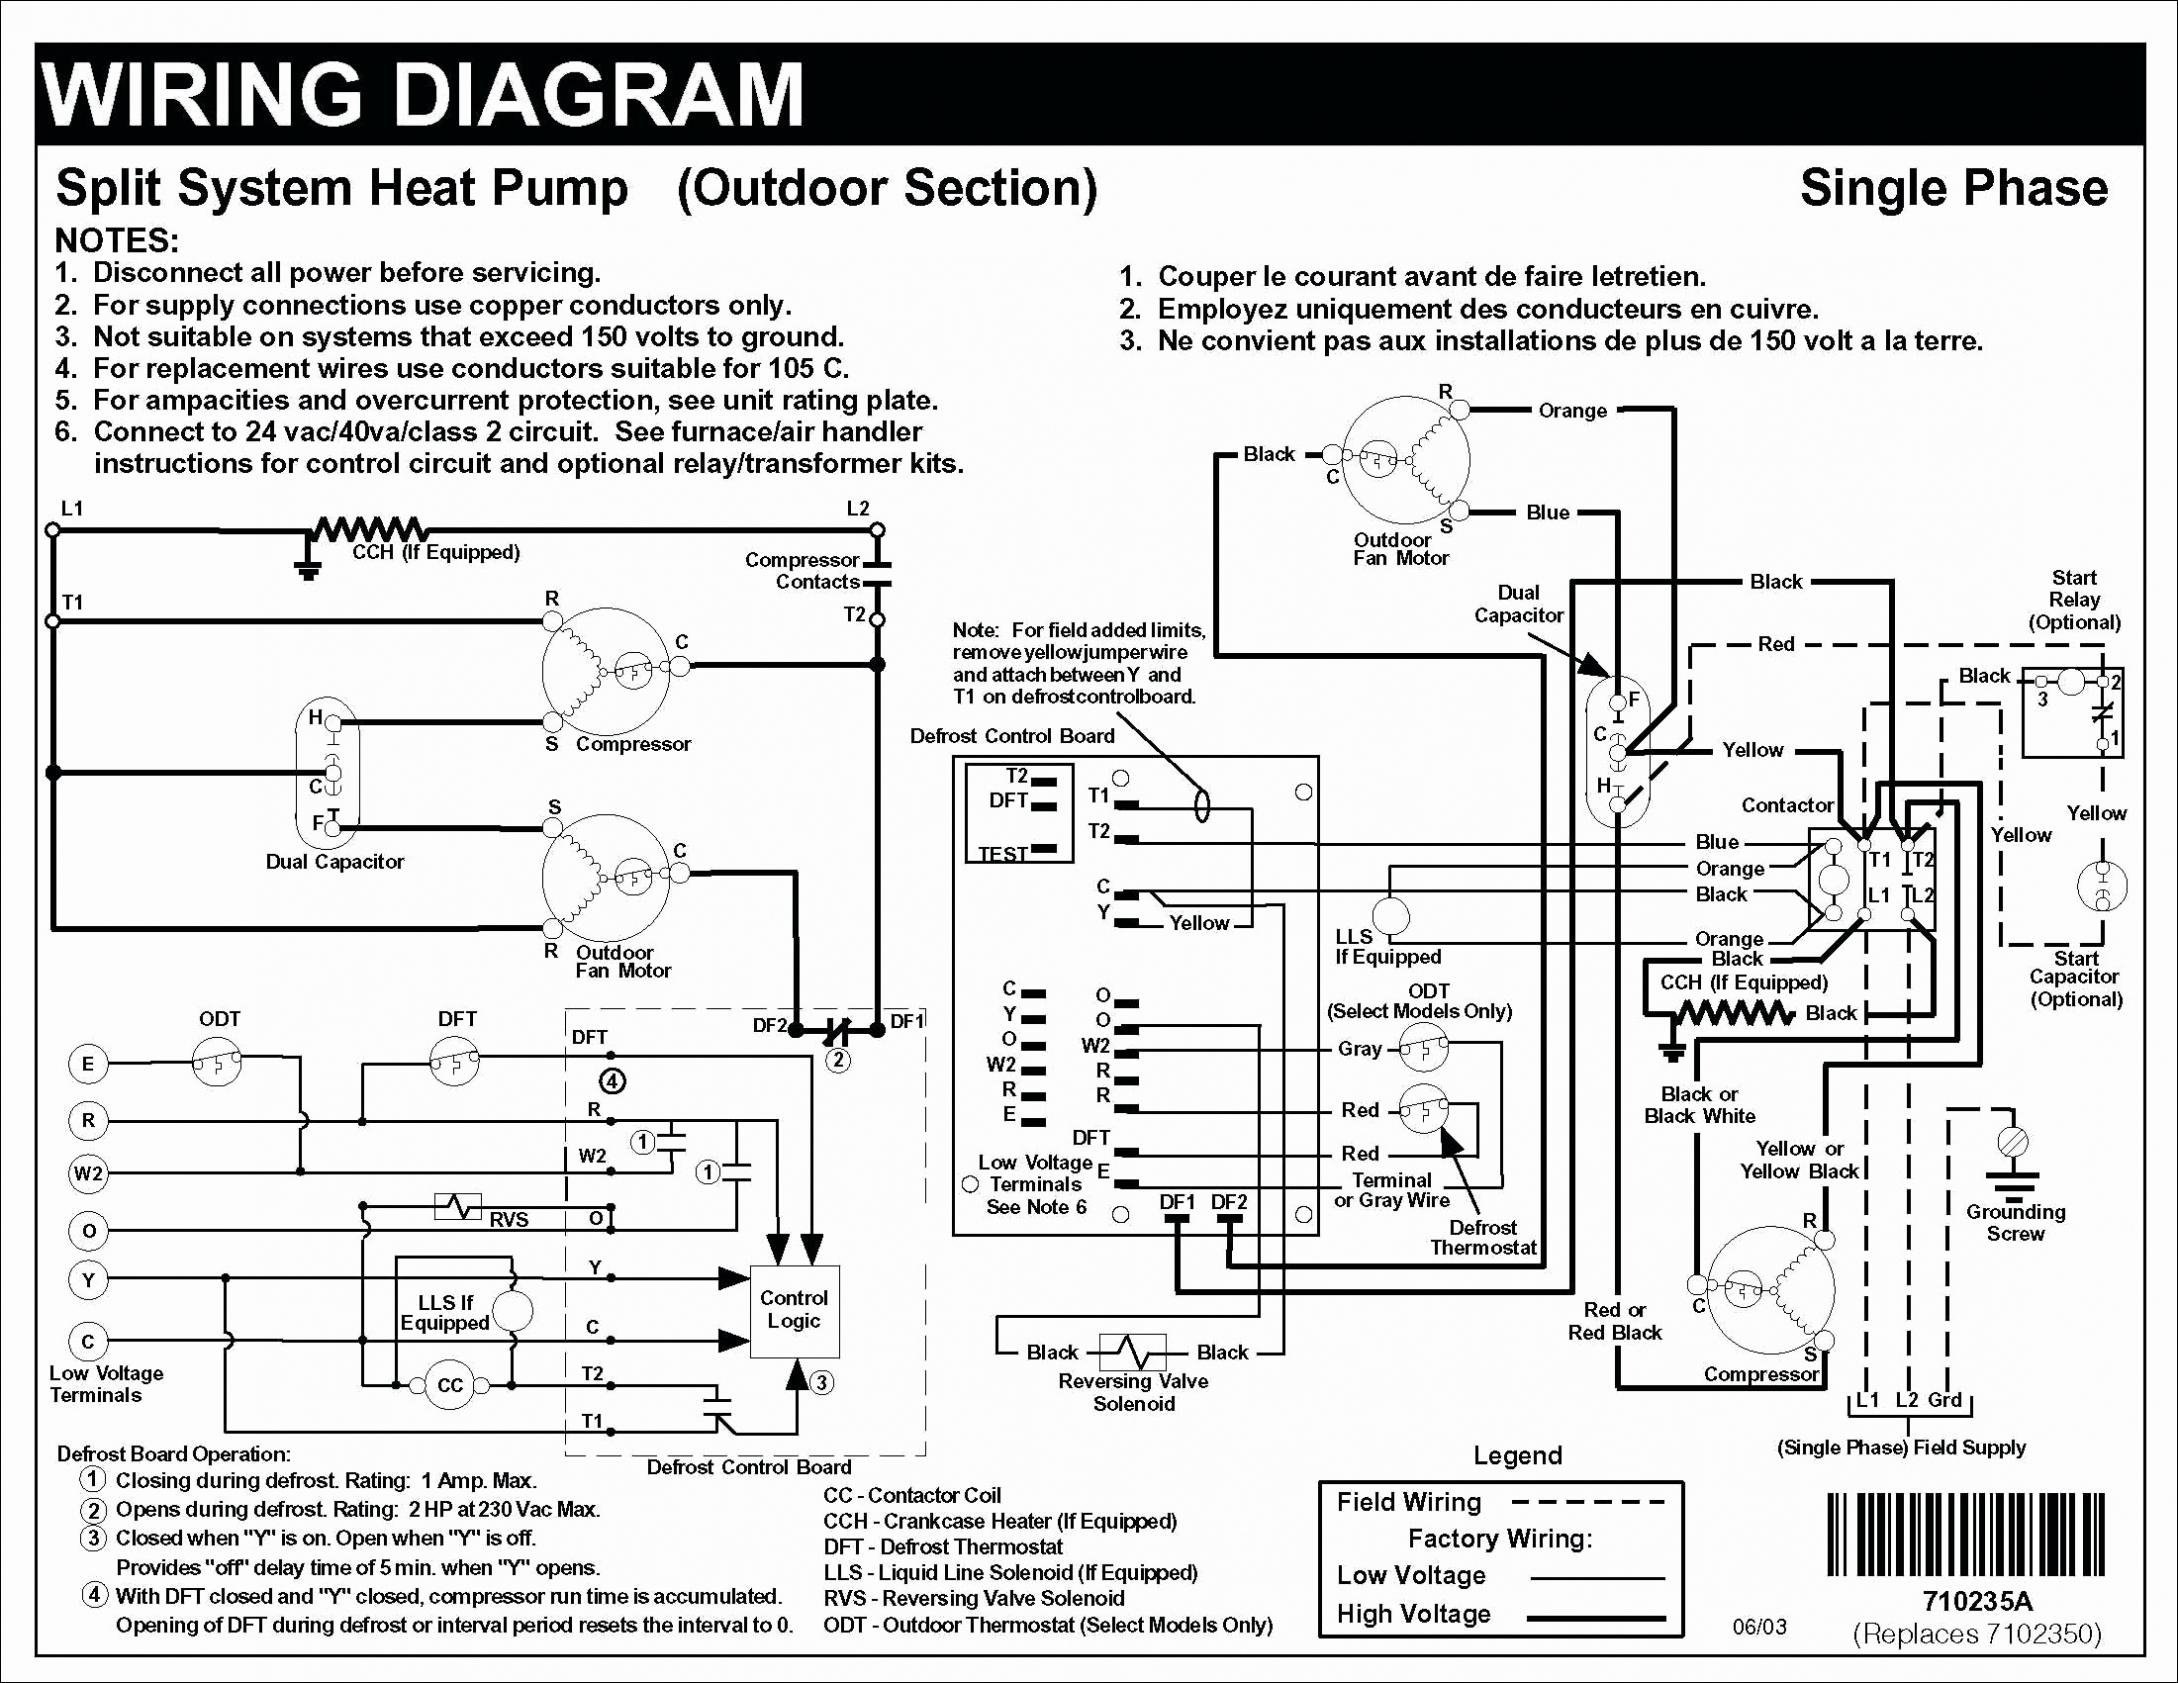 Wiring Diagram For Pioneer Fh X700Bt | Wiring Diagram - Kenwood Kdc 248U Wiring Diagram